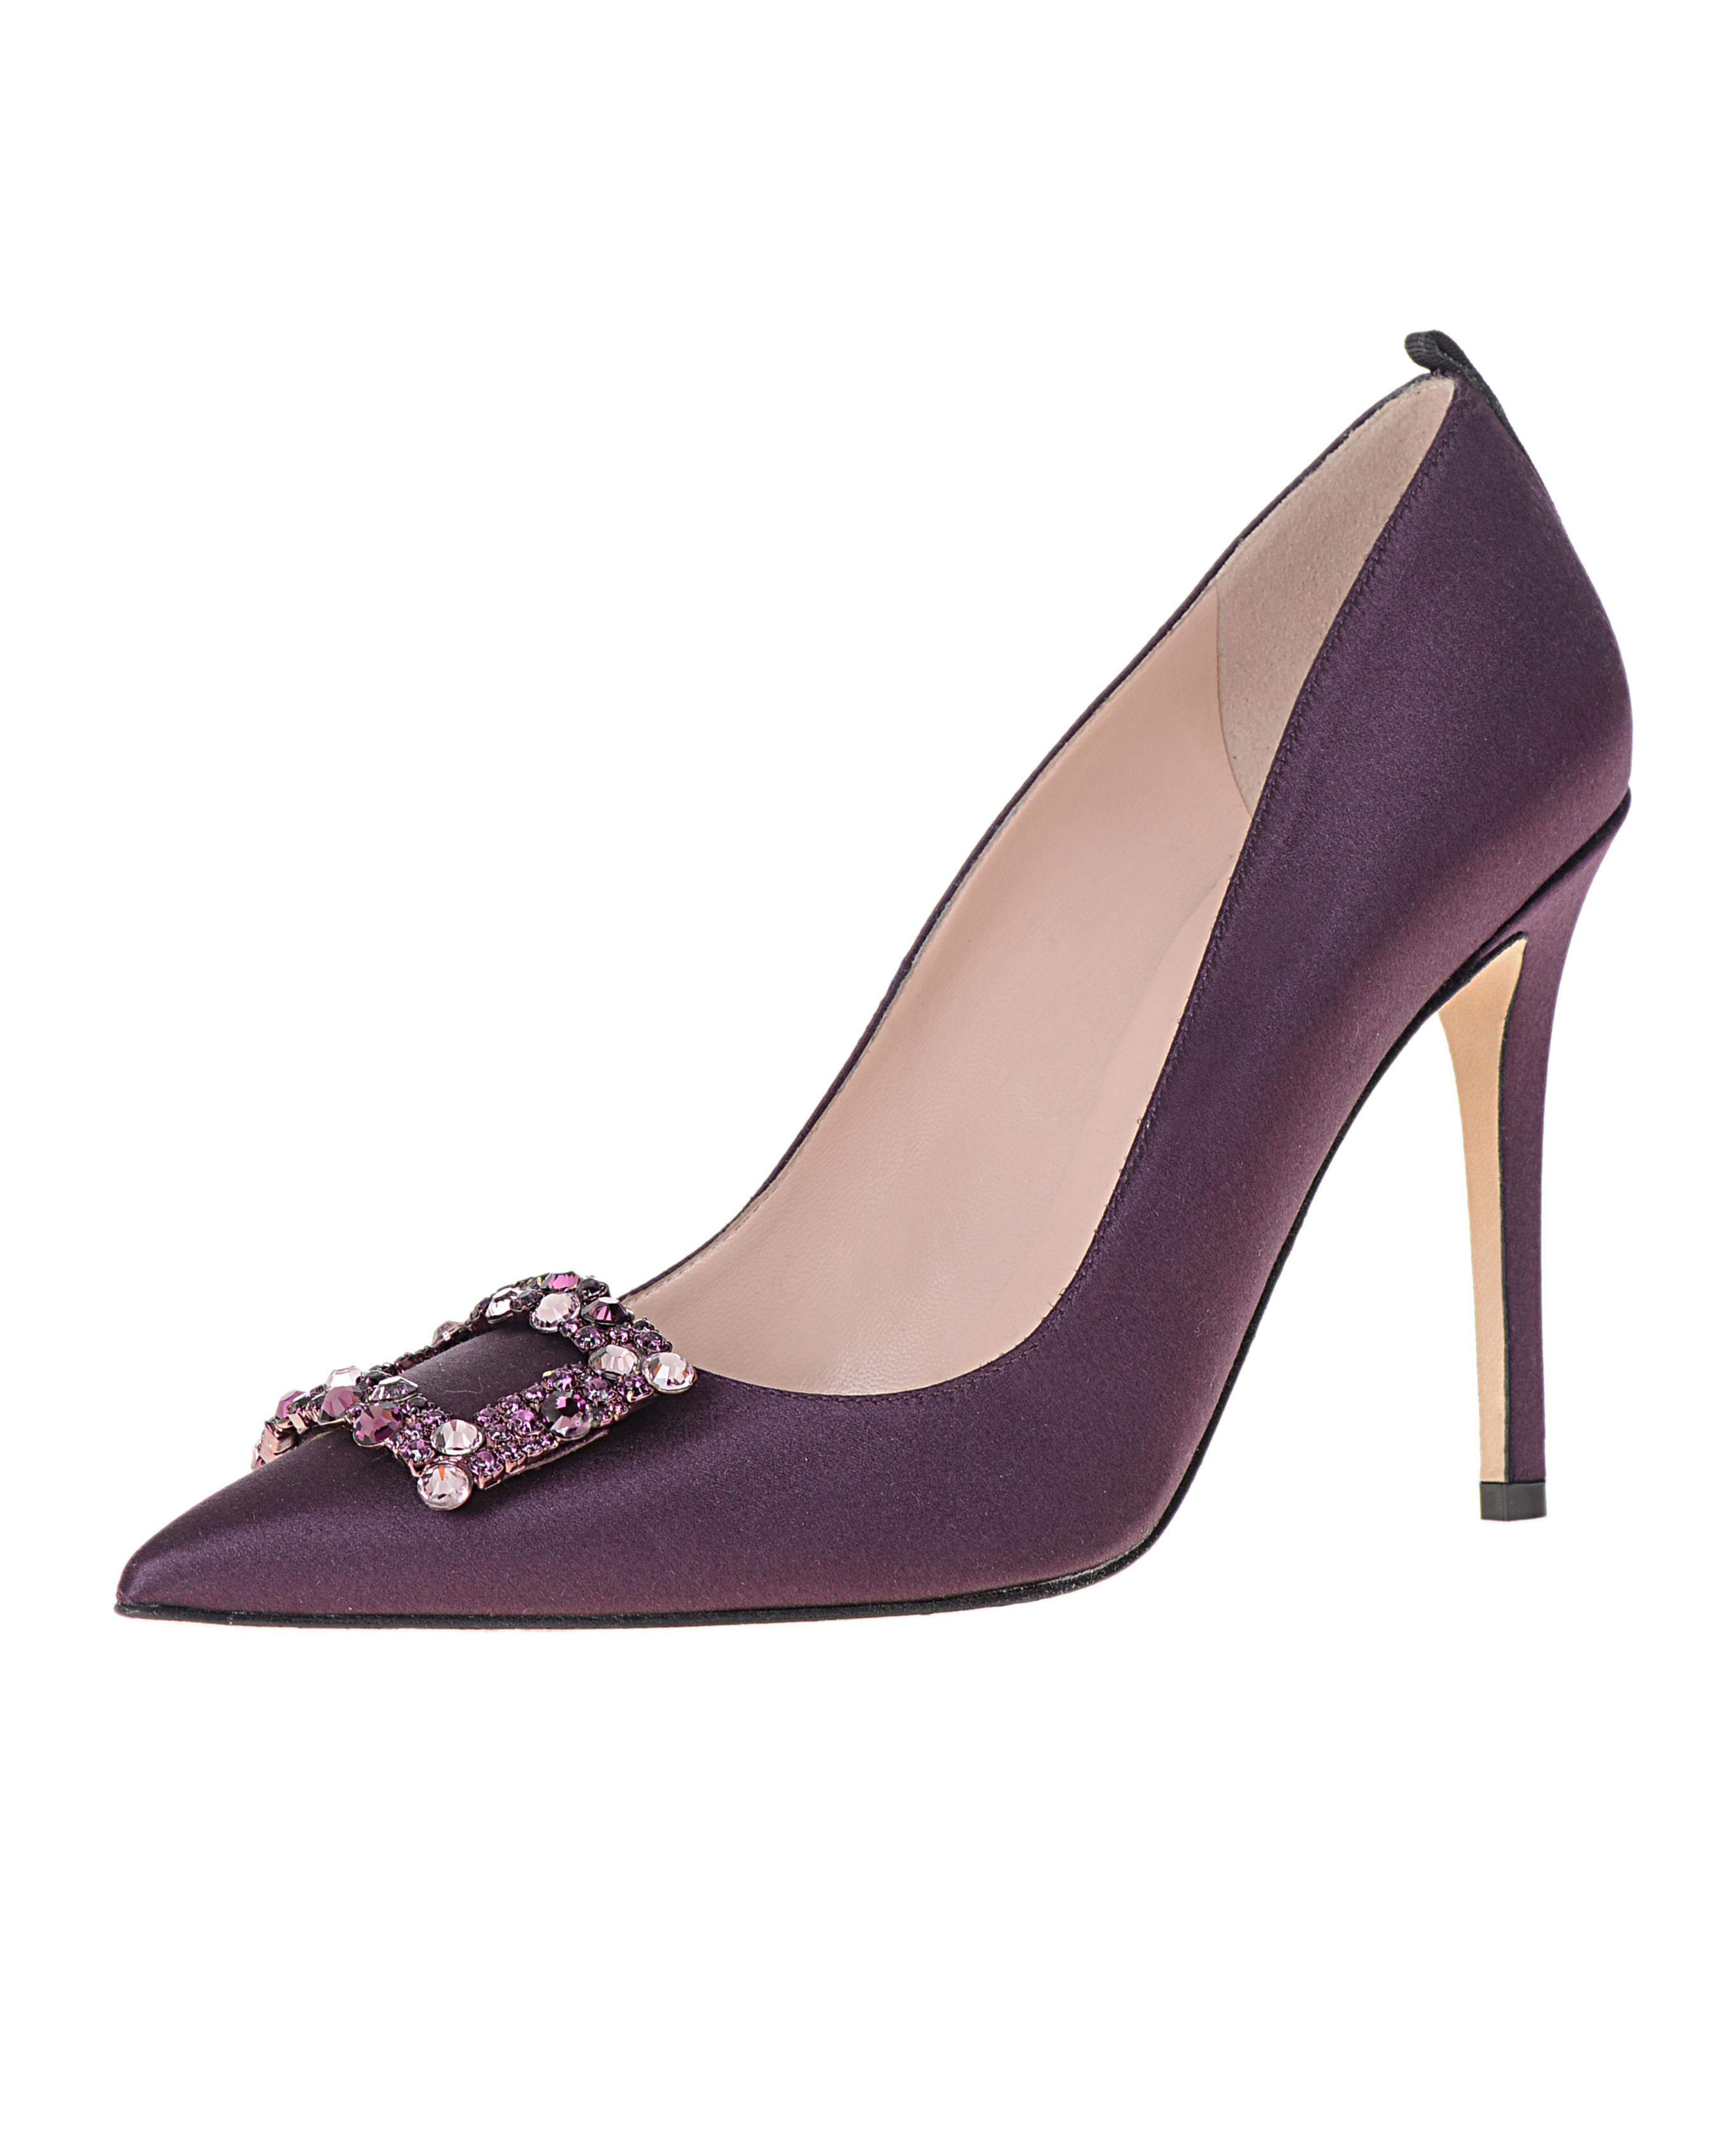 sjp-bridal-shoes-mary-0515.jpg